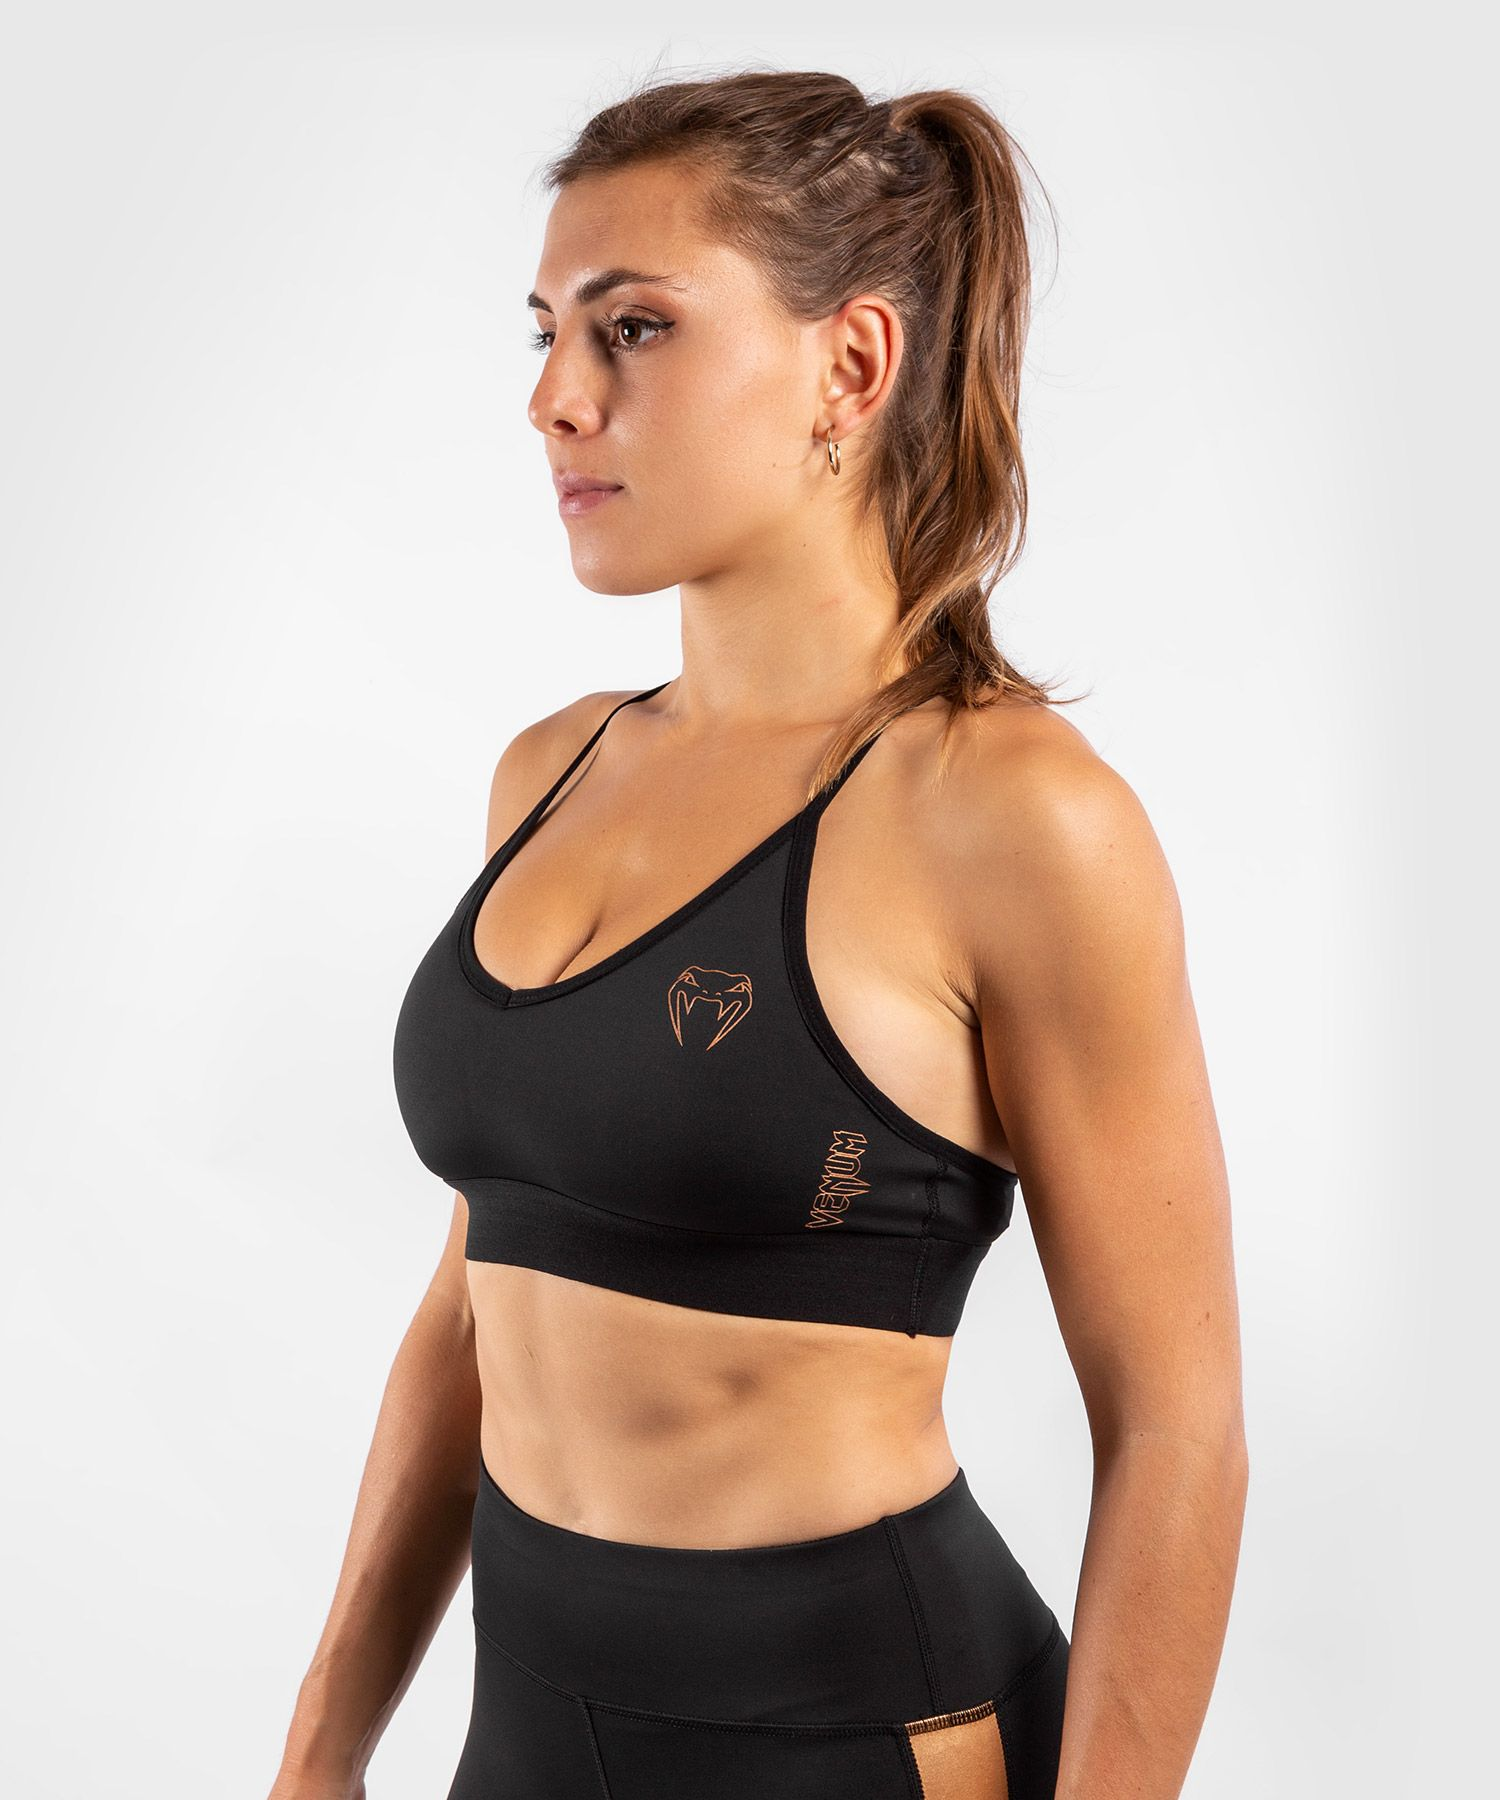 Venum Tecmo Sport Bra - For Women - Black/Bronze